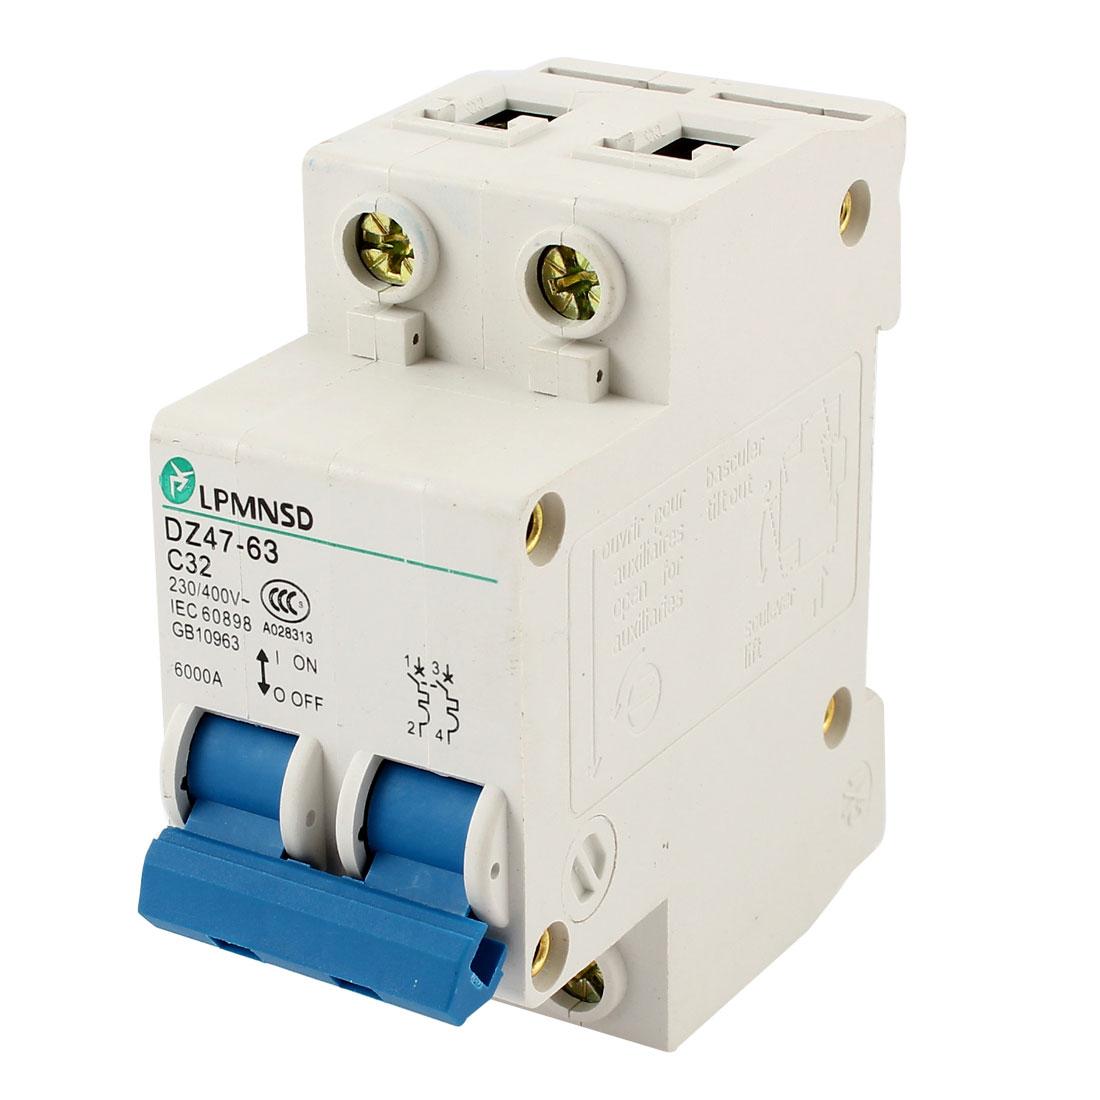 DZ47-63 C32 Overload 2 Pole Miniature Circuit Breaker AC 230/400V 32A